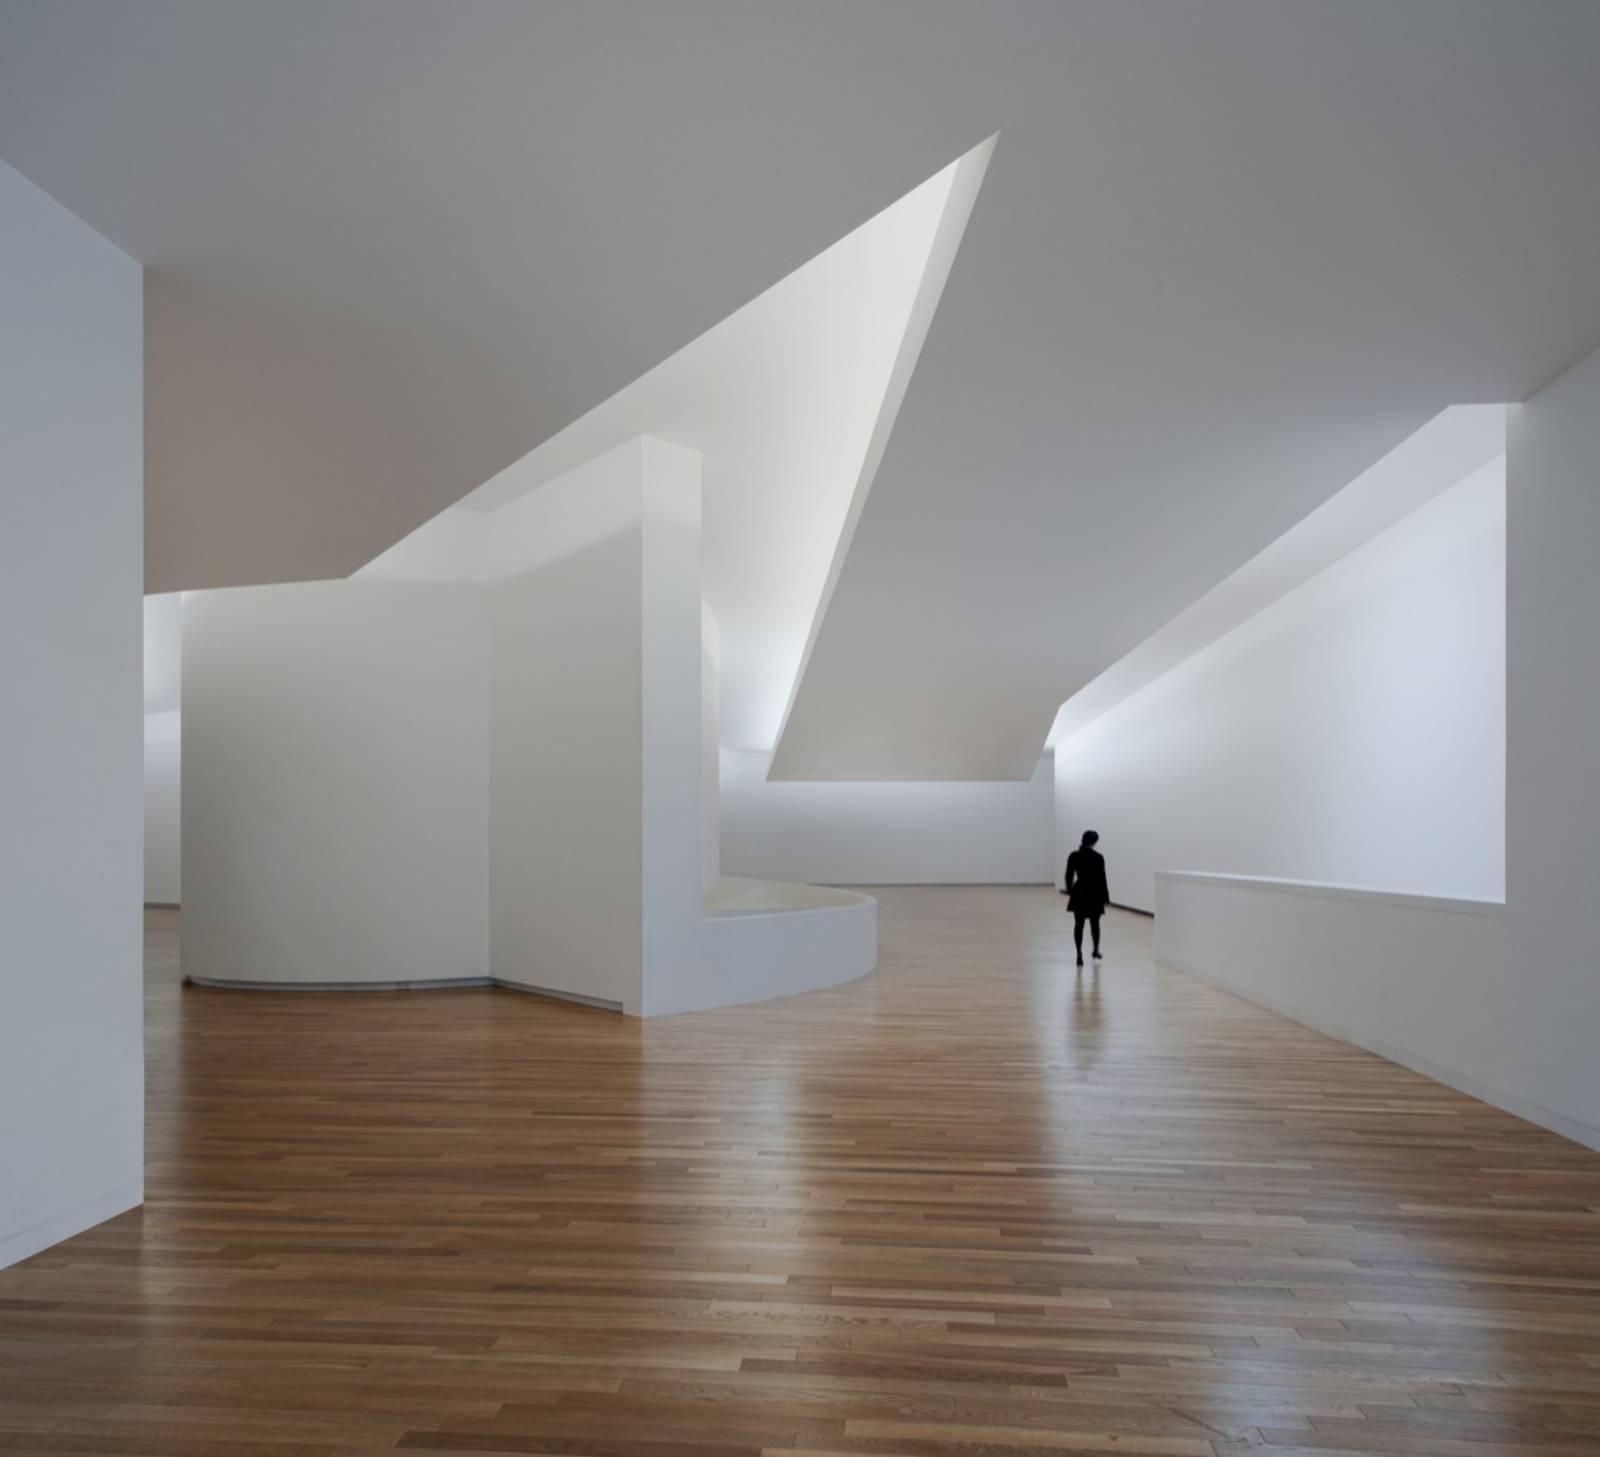 MIMESIS MUSEUM BY ALVARO SIZA VIERA A As Architecture